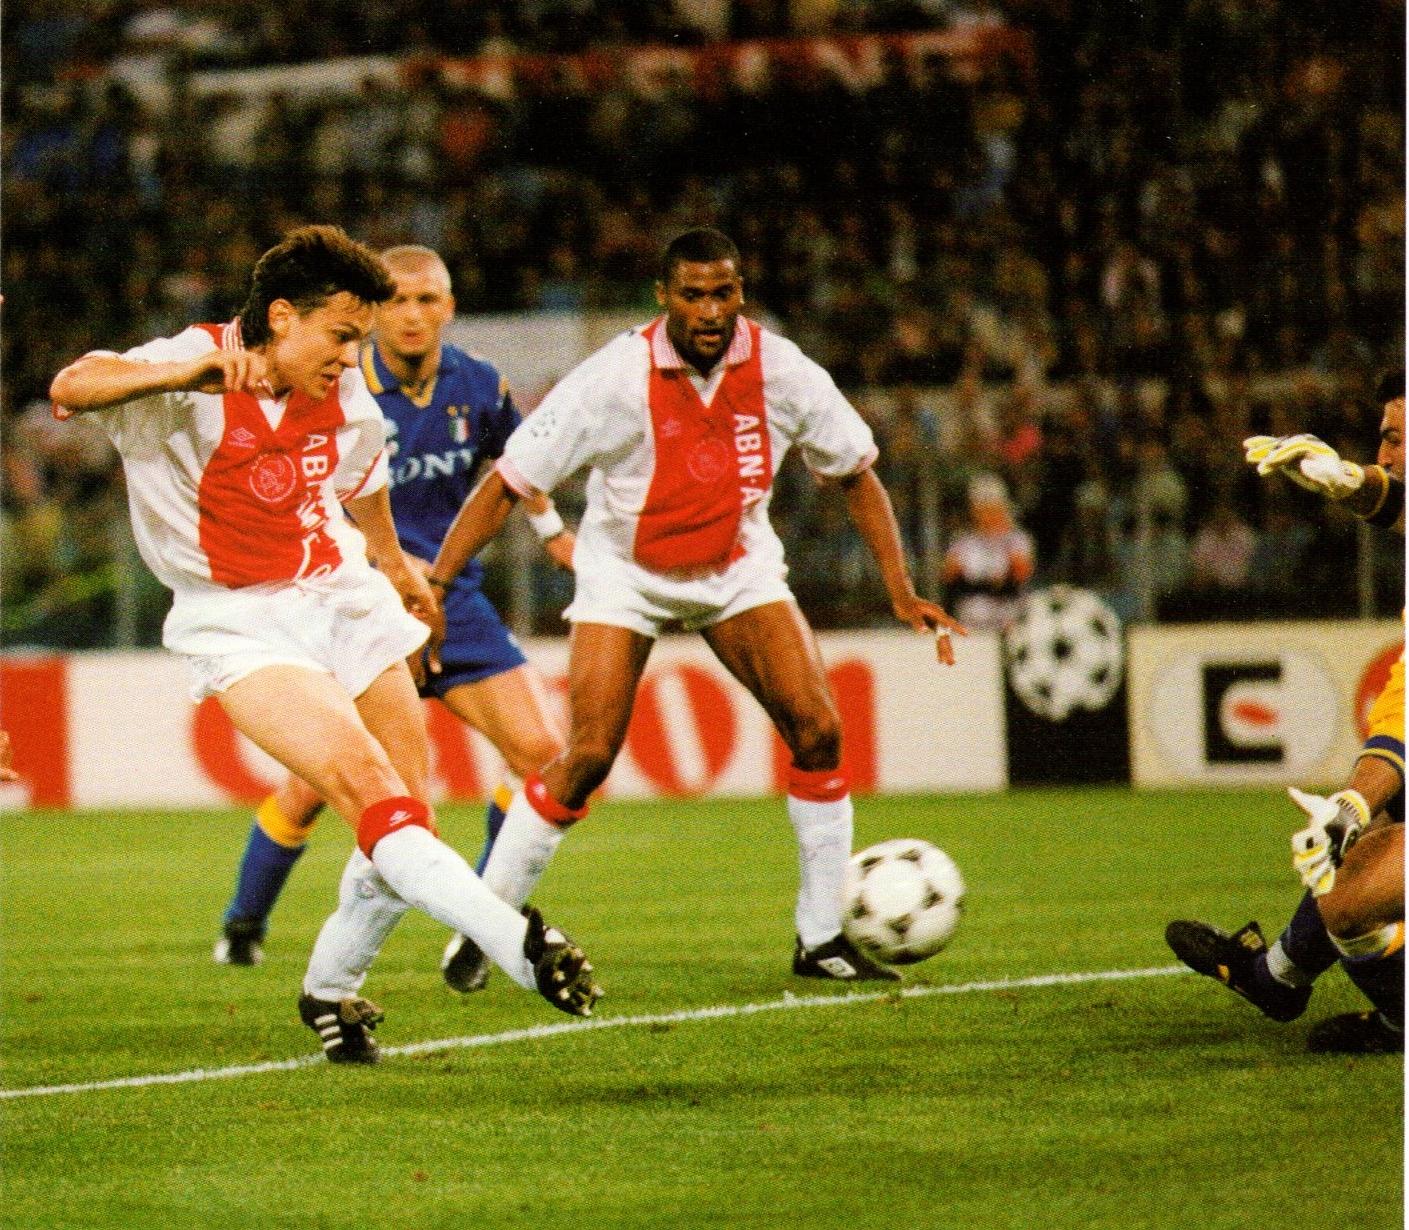 Prediksi Skor Tottenham Vs Ajax Amsterdam: Soccer Nostalgia: Old Match Photographs-Part 32h